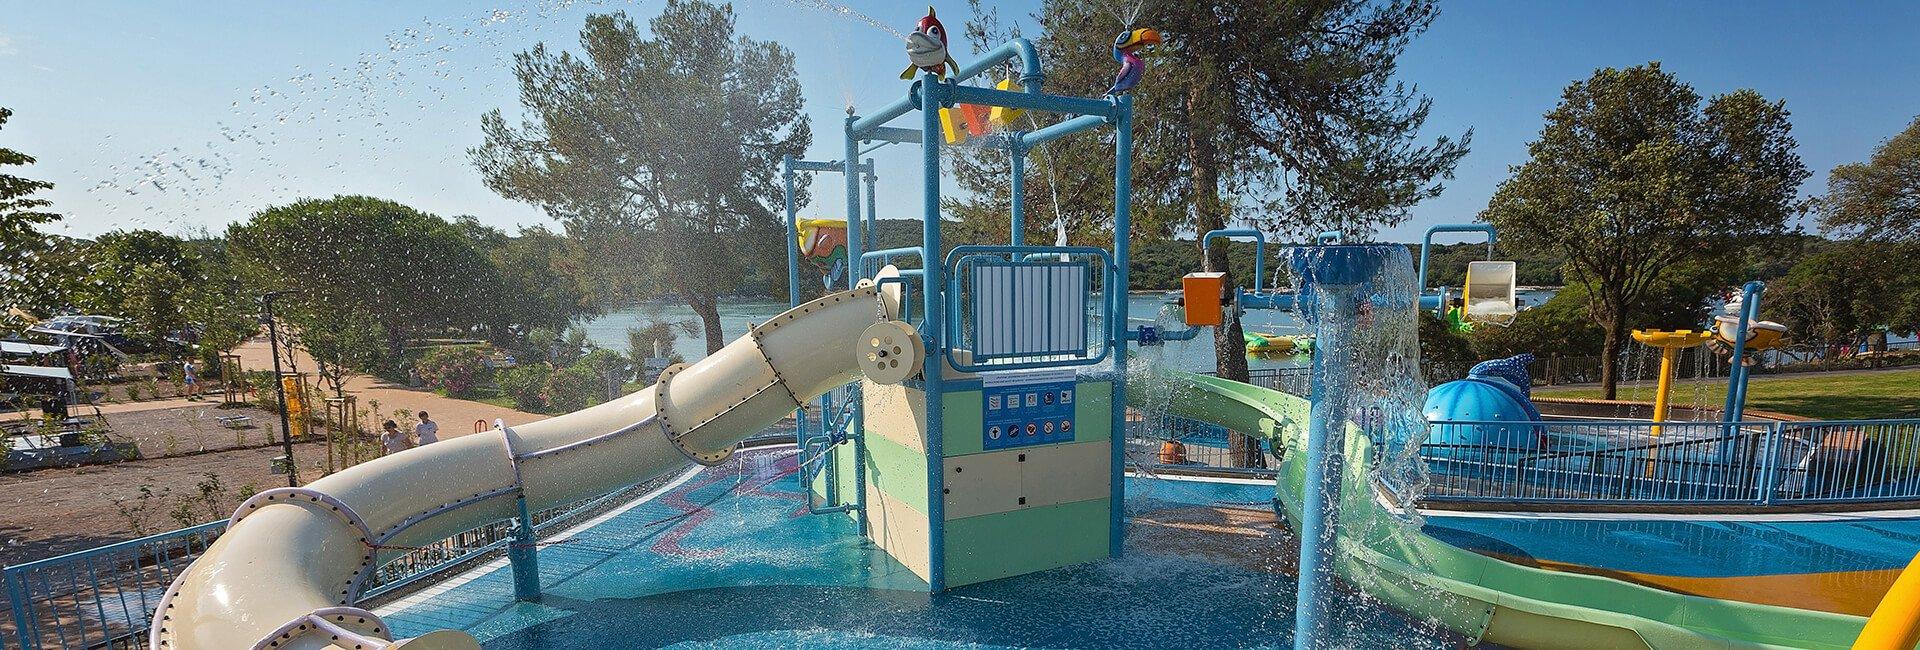 Kamp Veštar Spray park | AdriaCamps